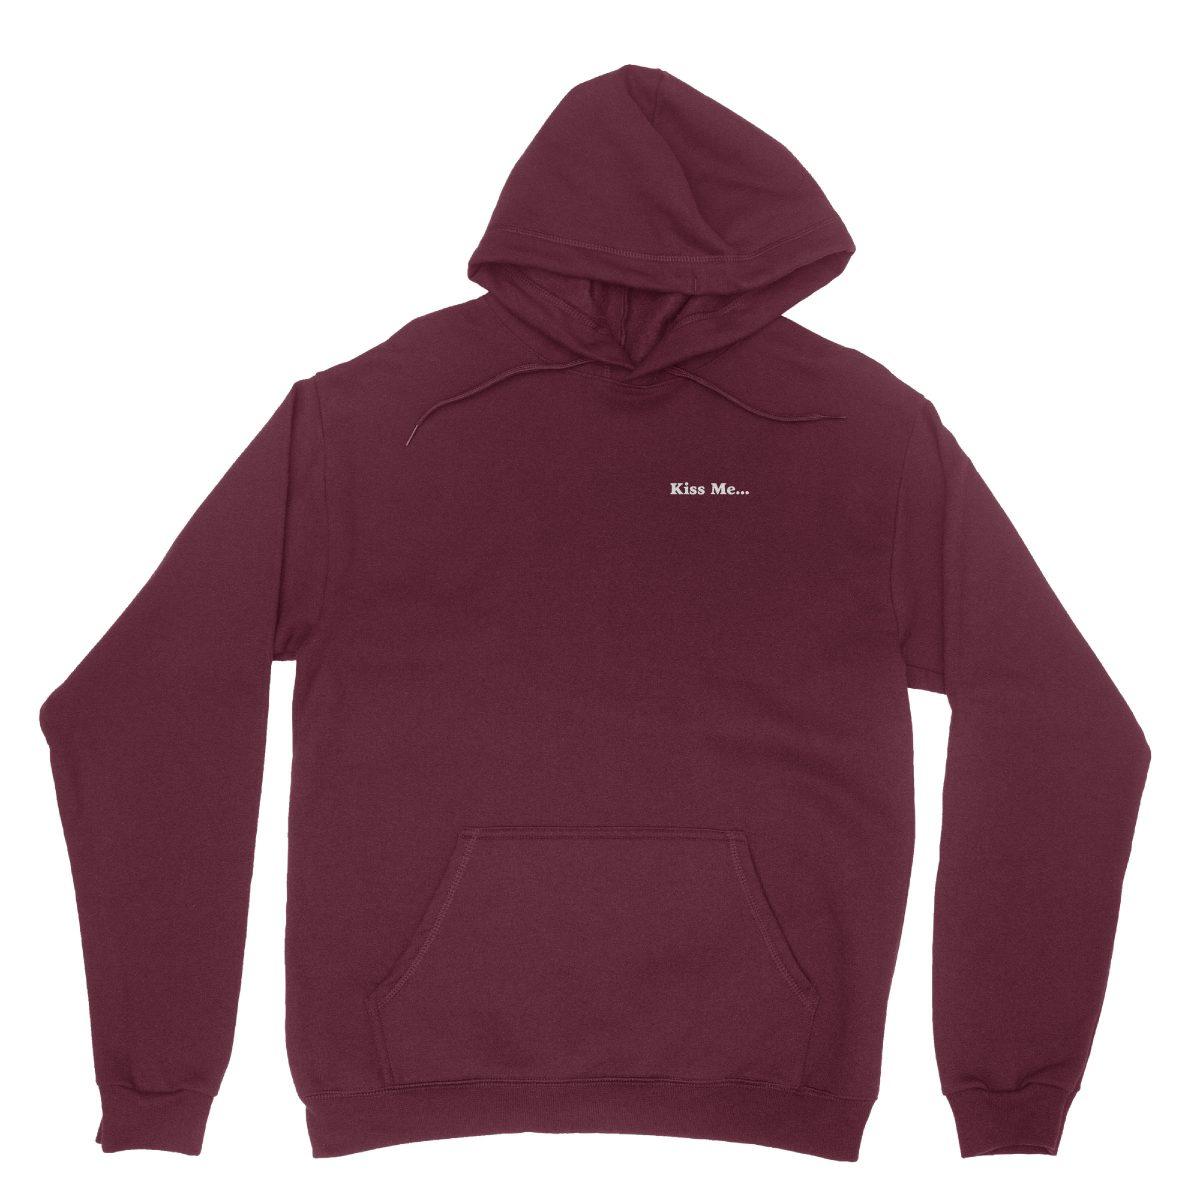 """kiss me between my legs"" hidden message hoodies in maroon by kikicutt"